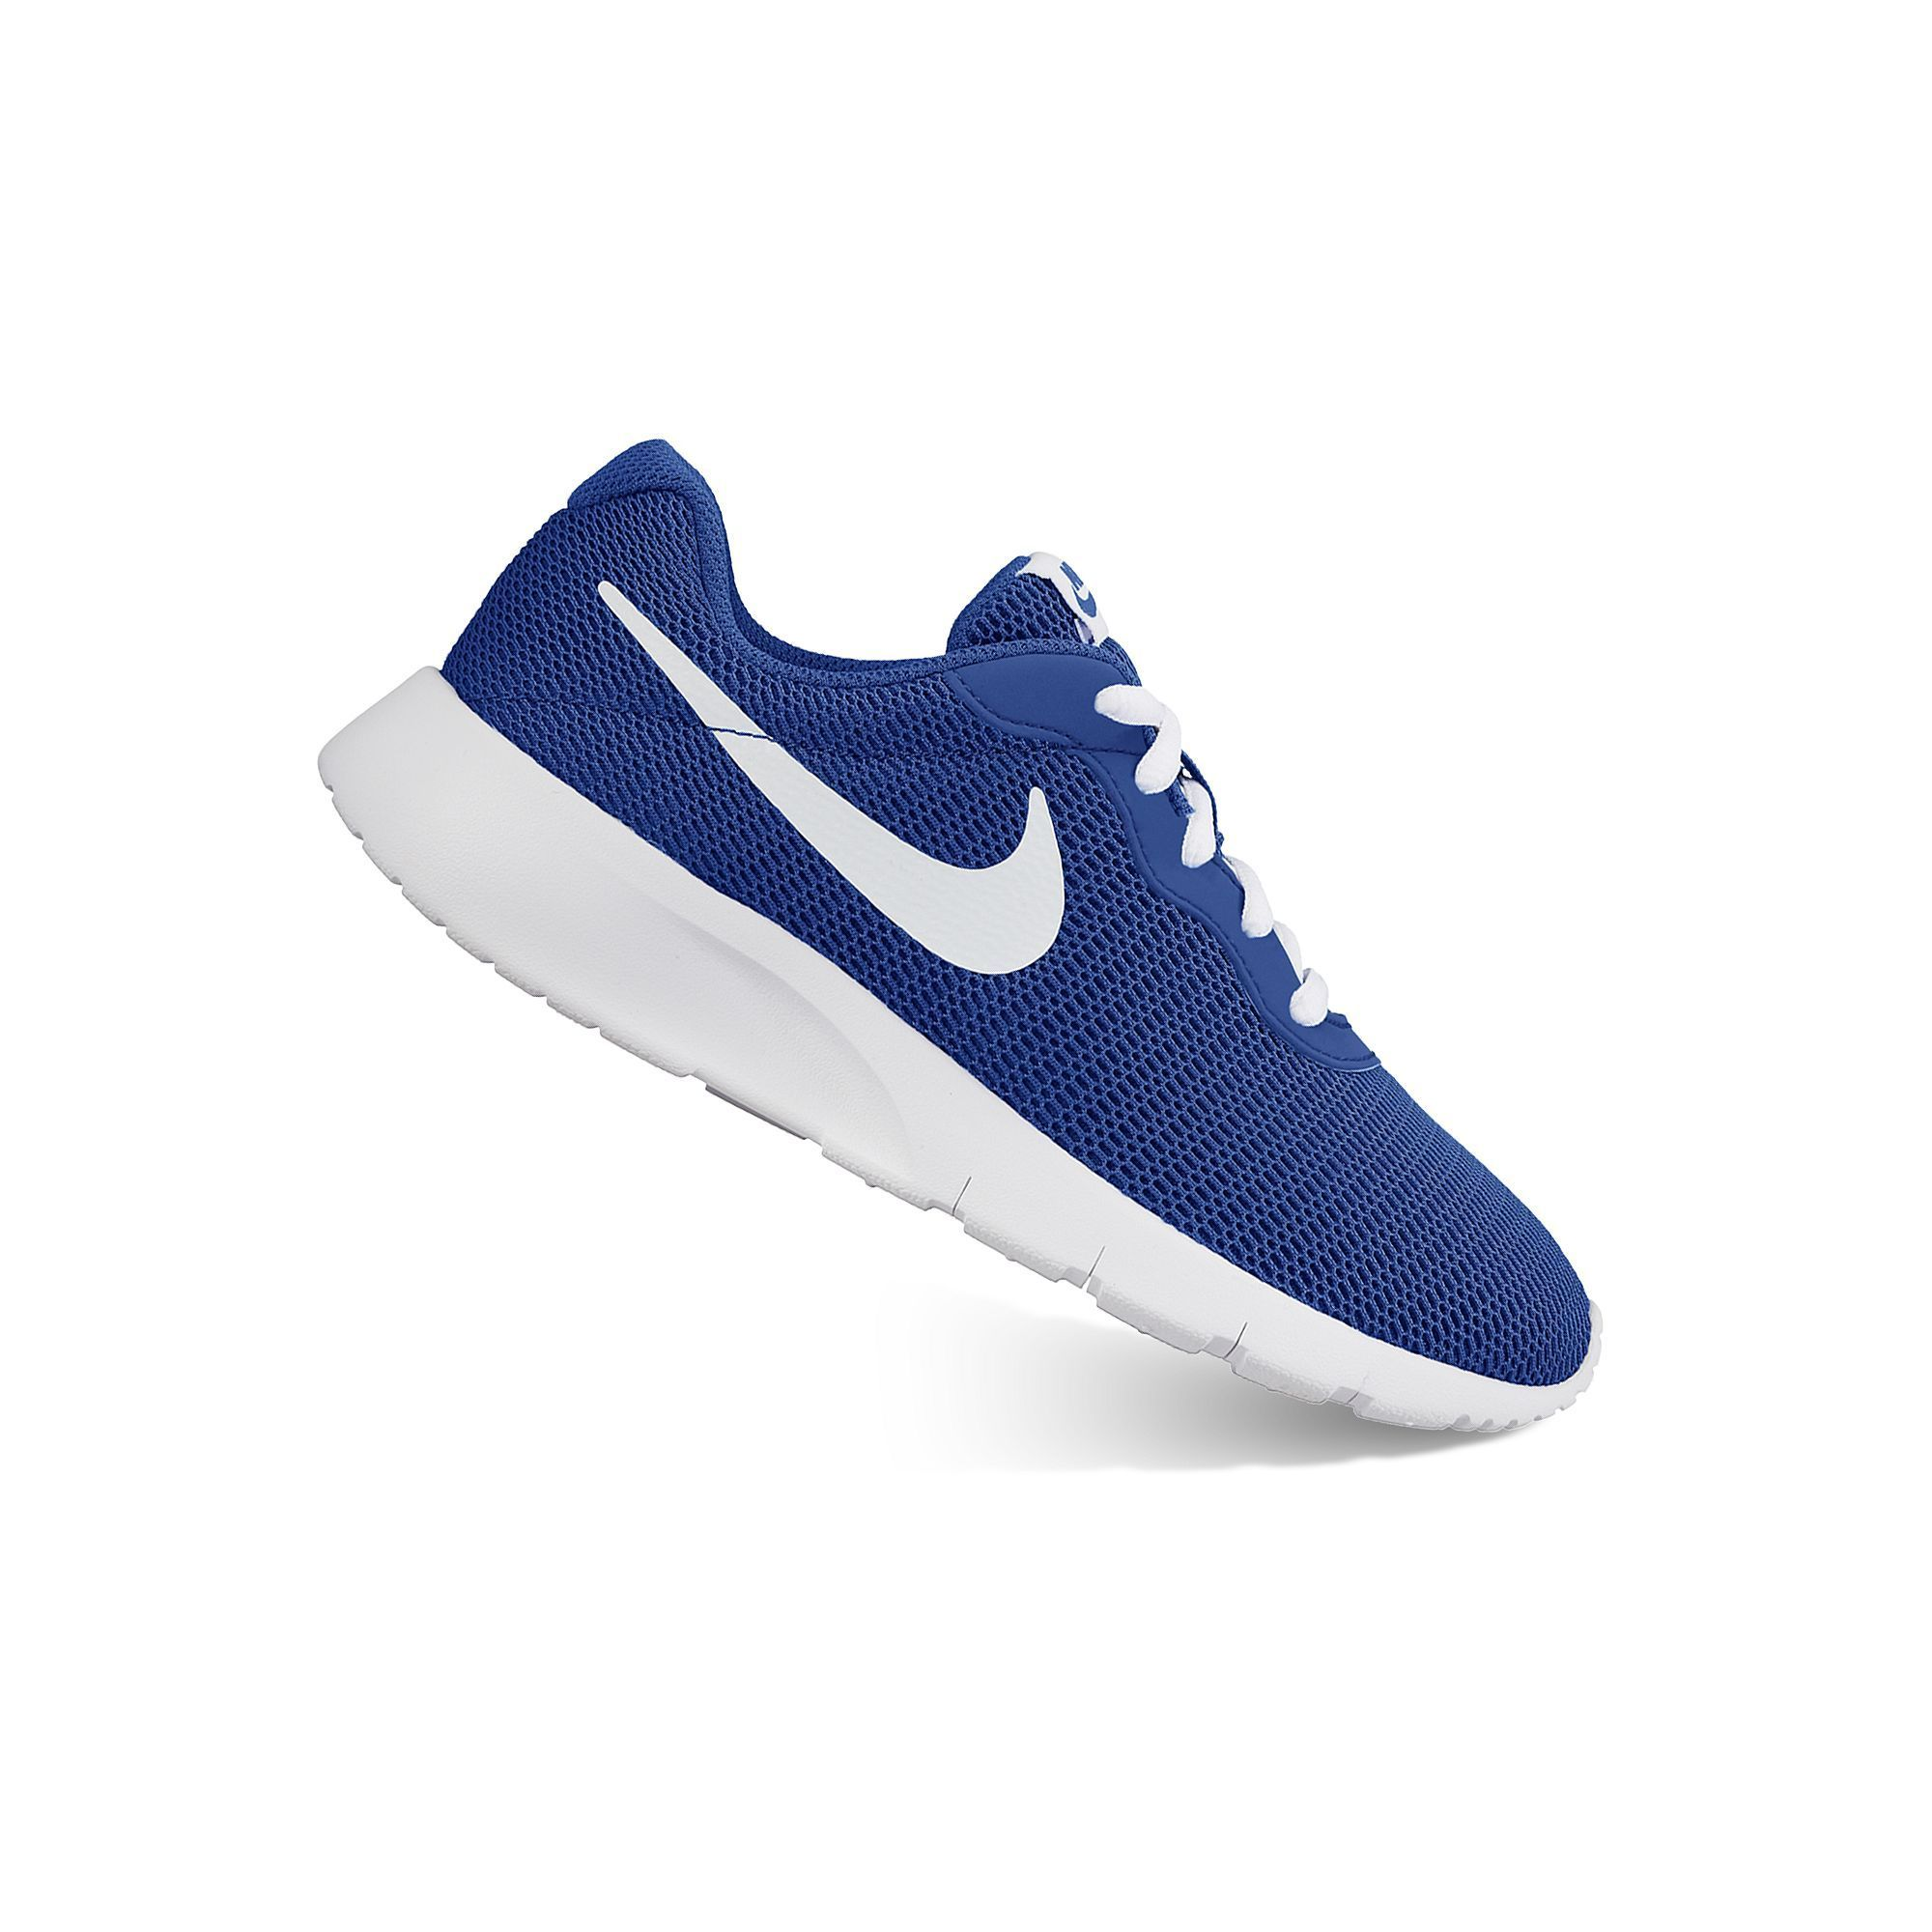 1f53698f1b2 ... 50% off nike tanjun boys running shoes boys size 5 blue 5e948 4b5da